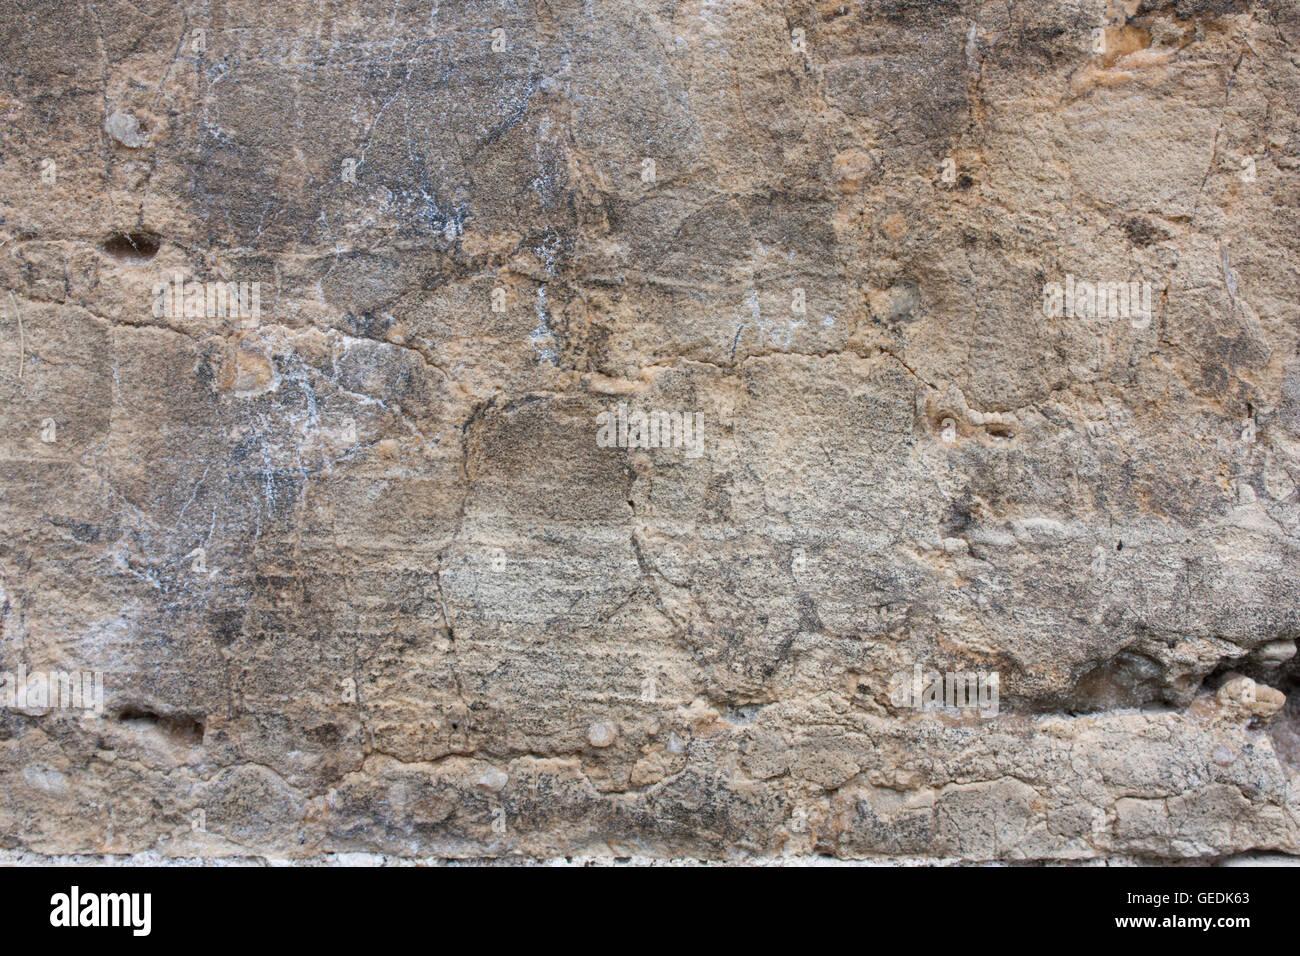 Rough Texture Background: Rough Rock Slab Stock Photos & Rough Rock Slab Stock